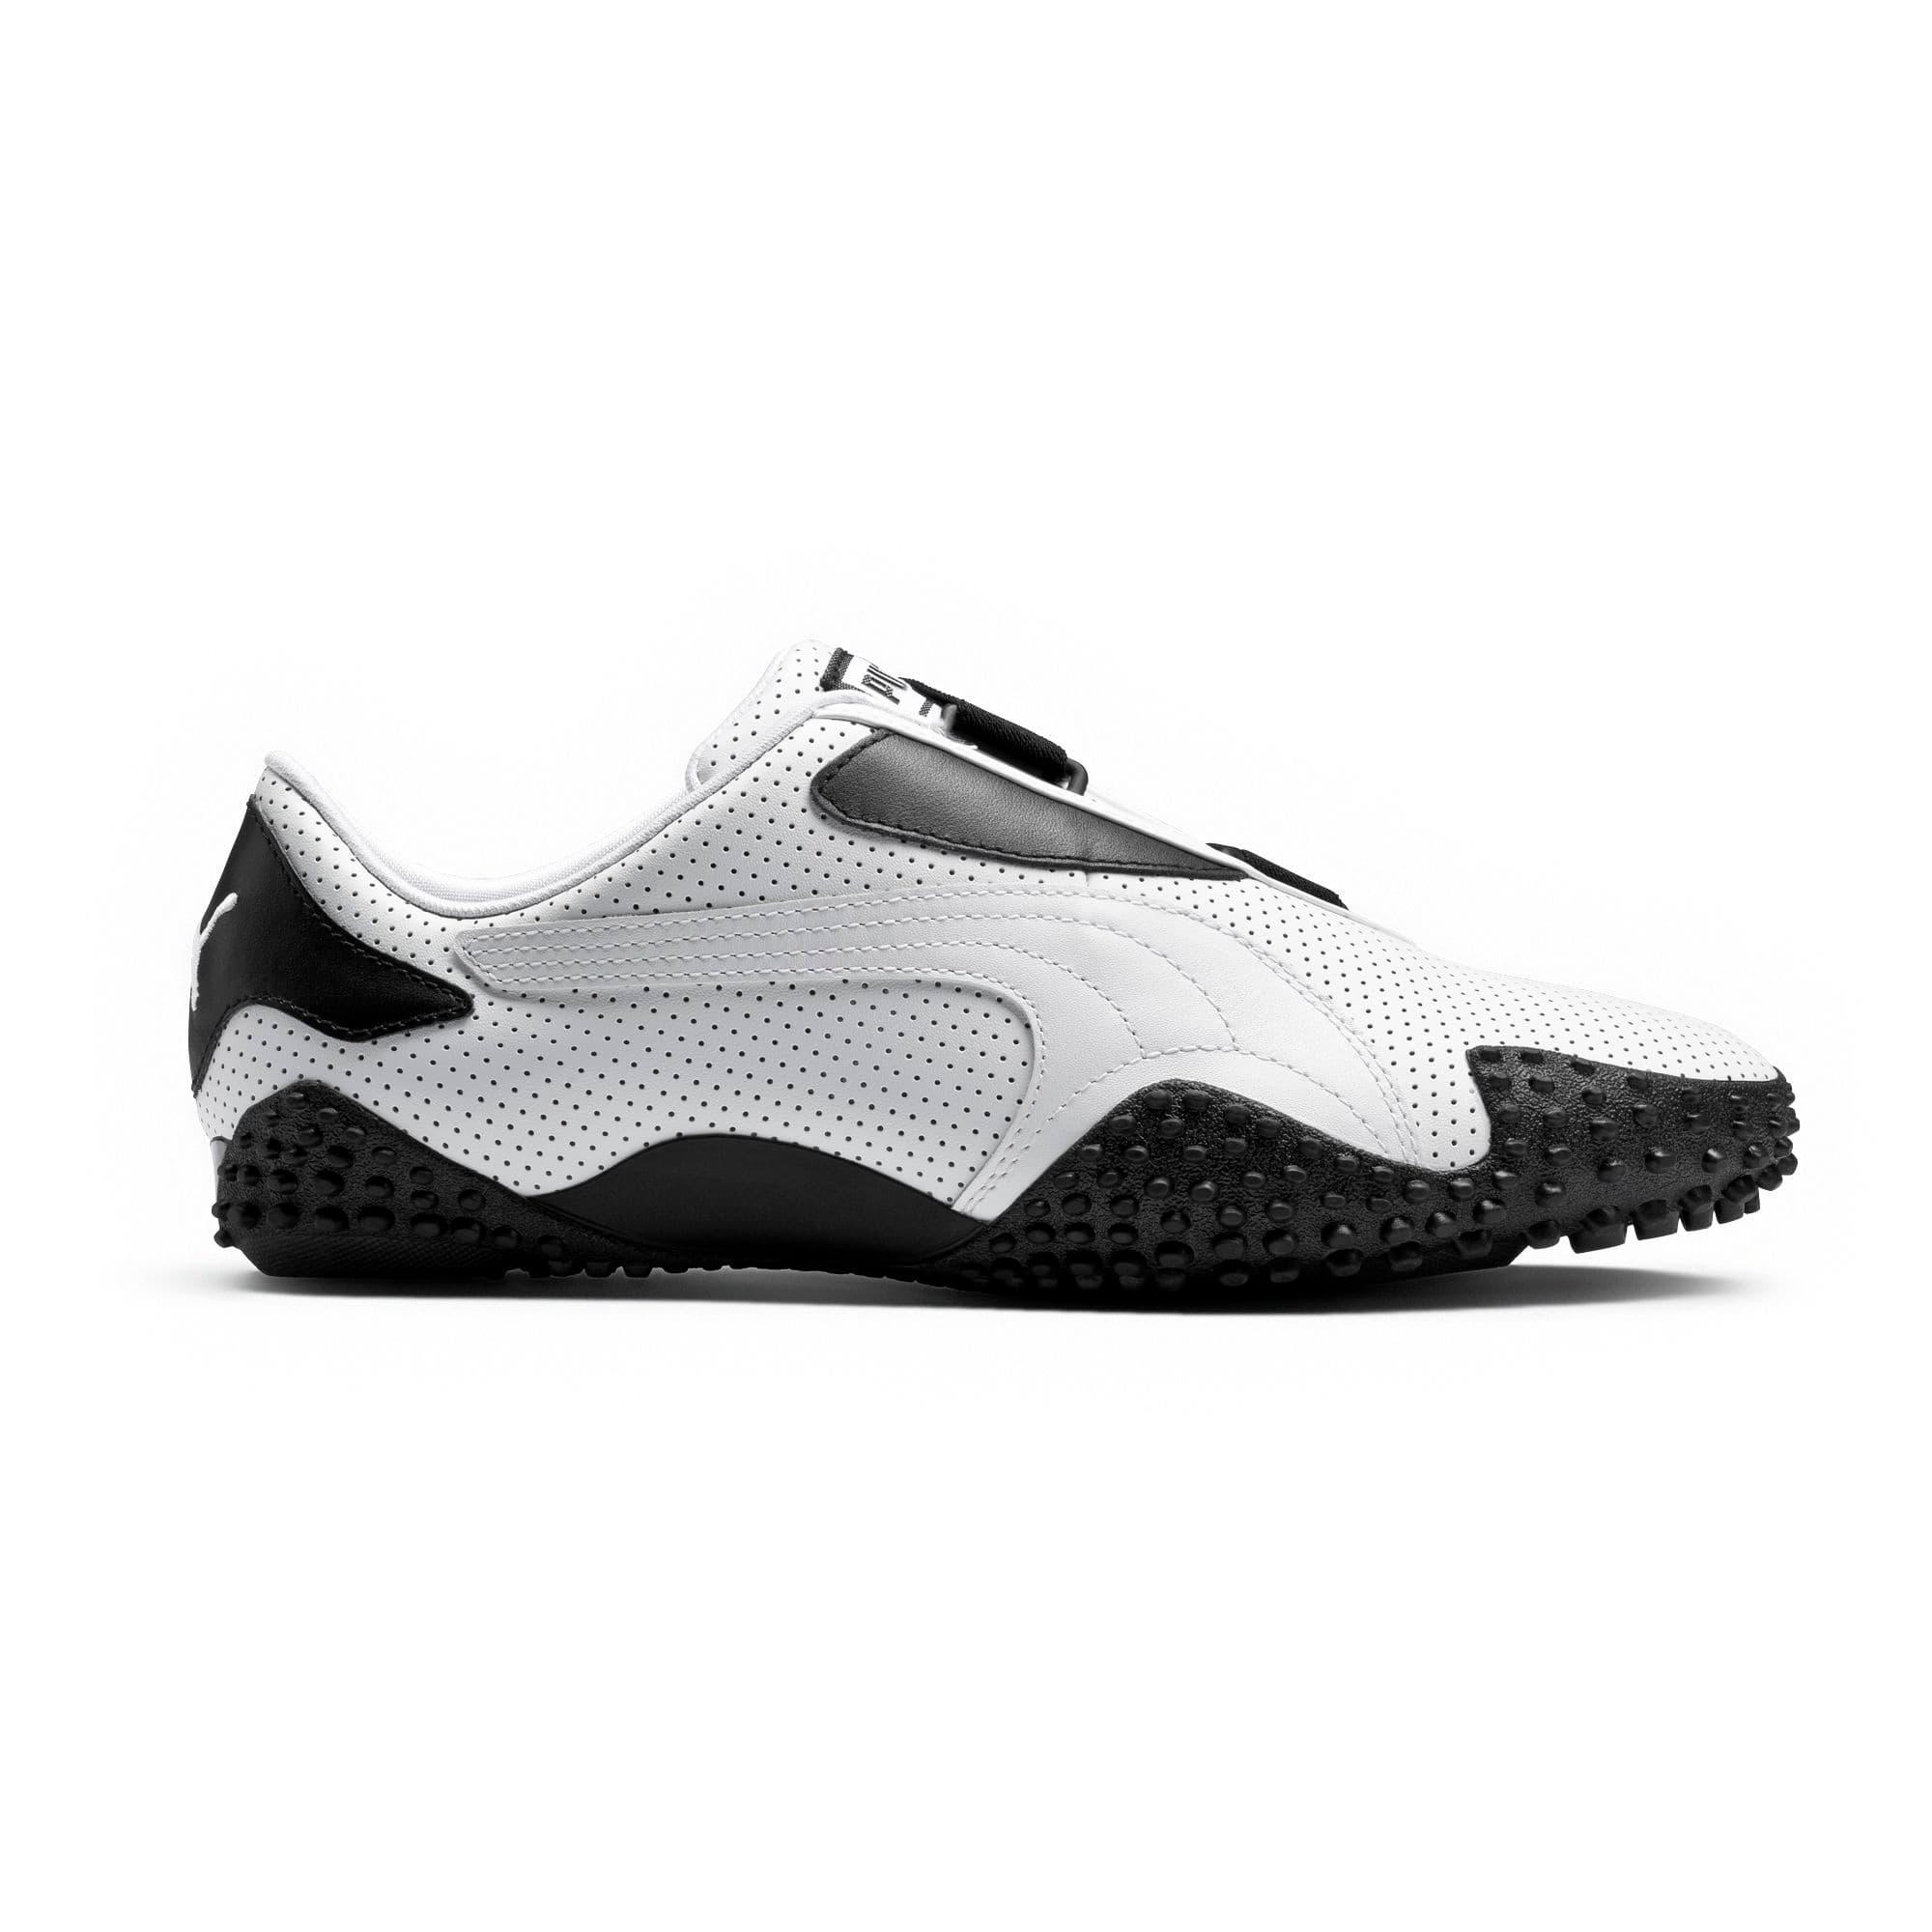 puma monster shoes Shop Clothing & Shoes Online